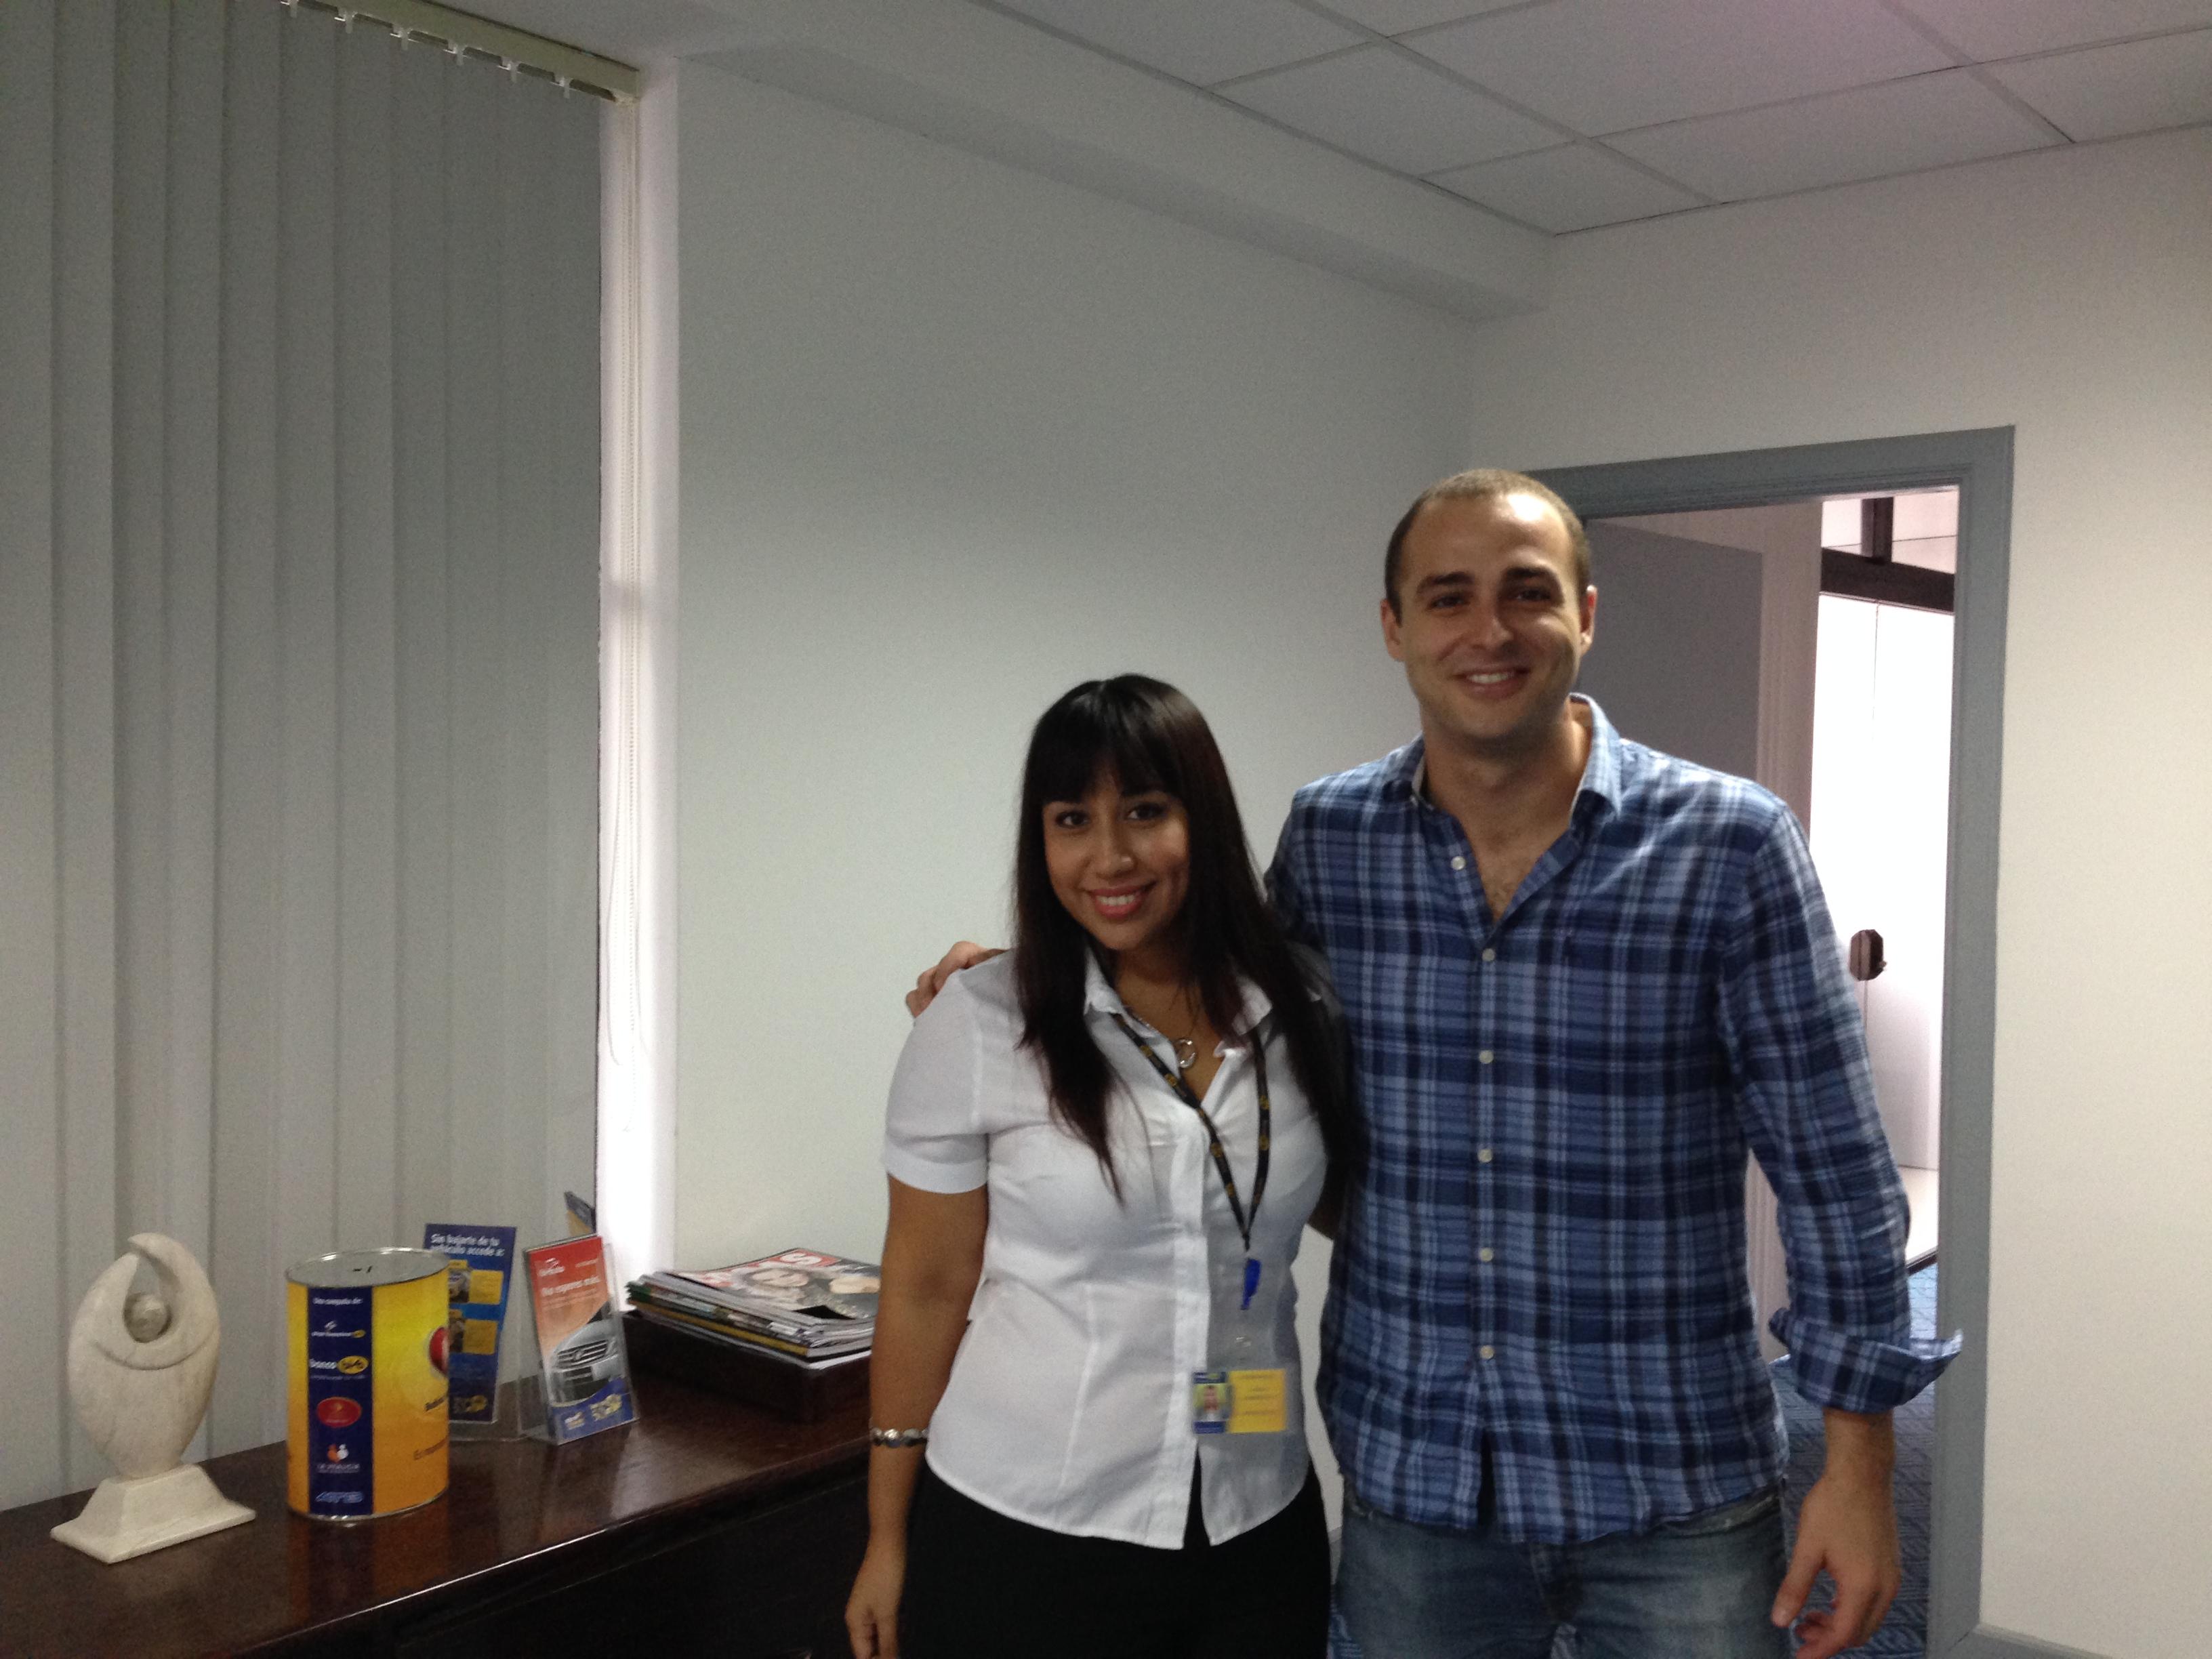 Con Joann Carrillo (Asistente de Marketing) de Banco Bisa